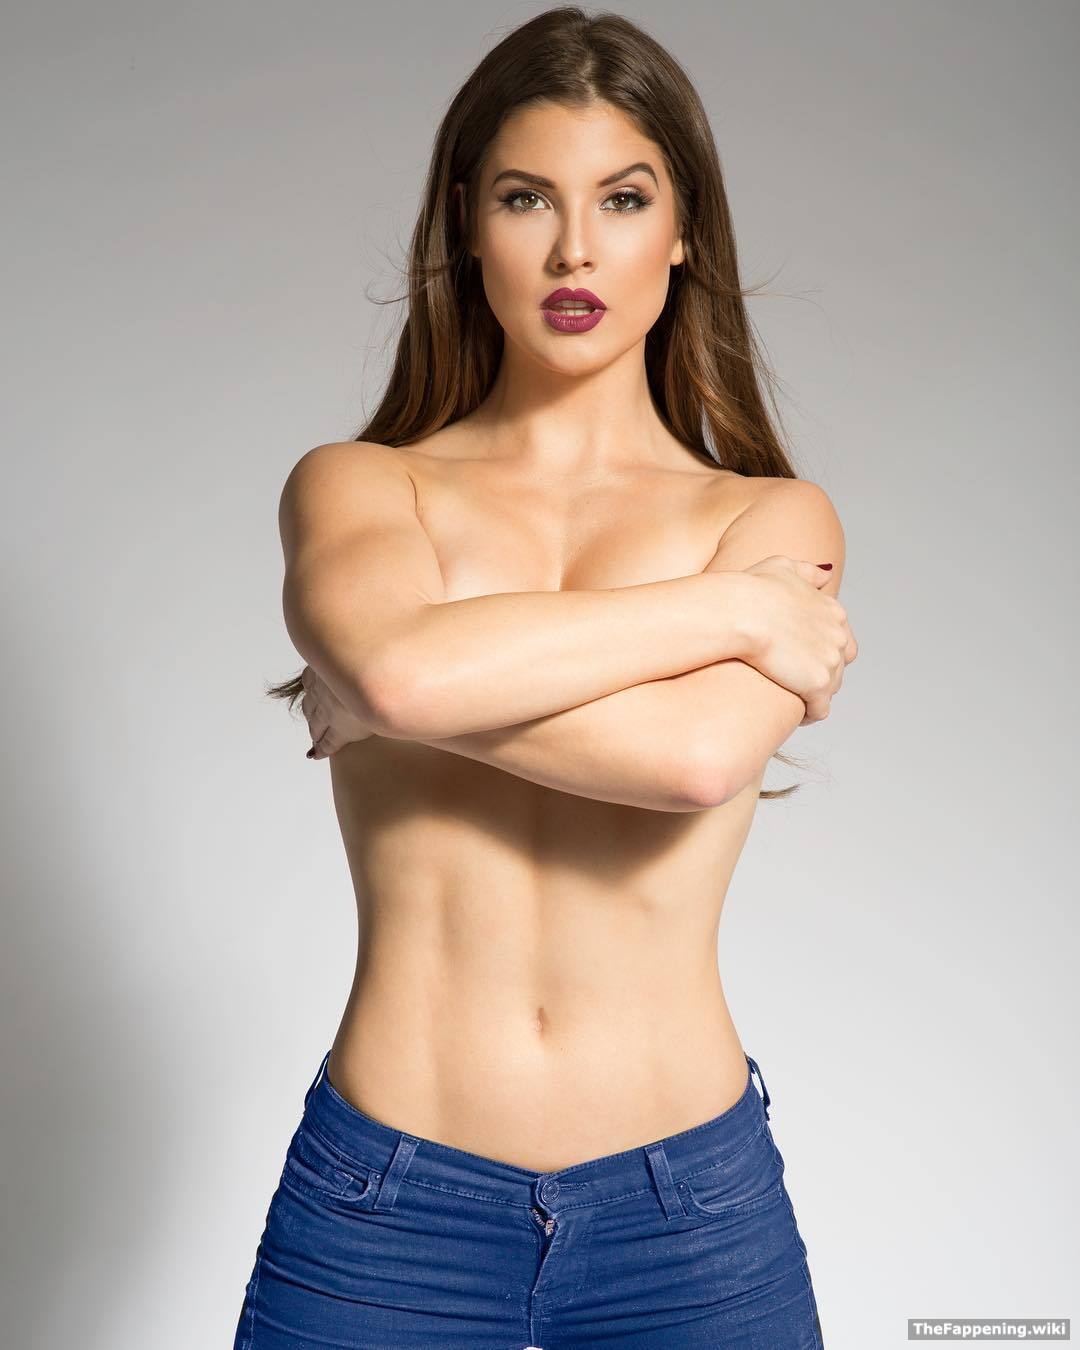 Amanda Jones Nude amanda cerny nude pics & vids - the fappening